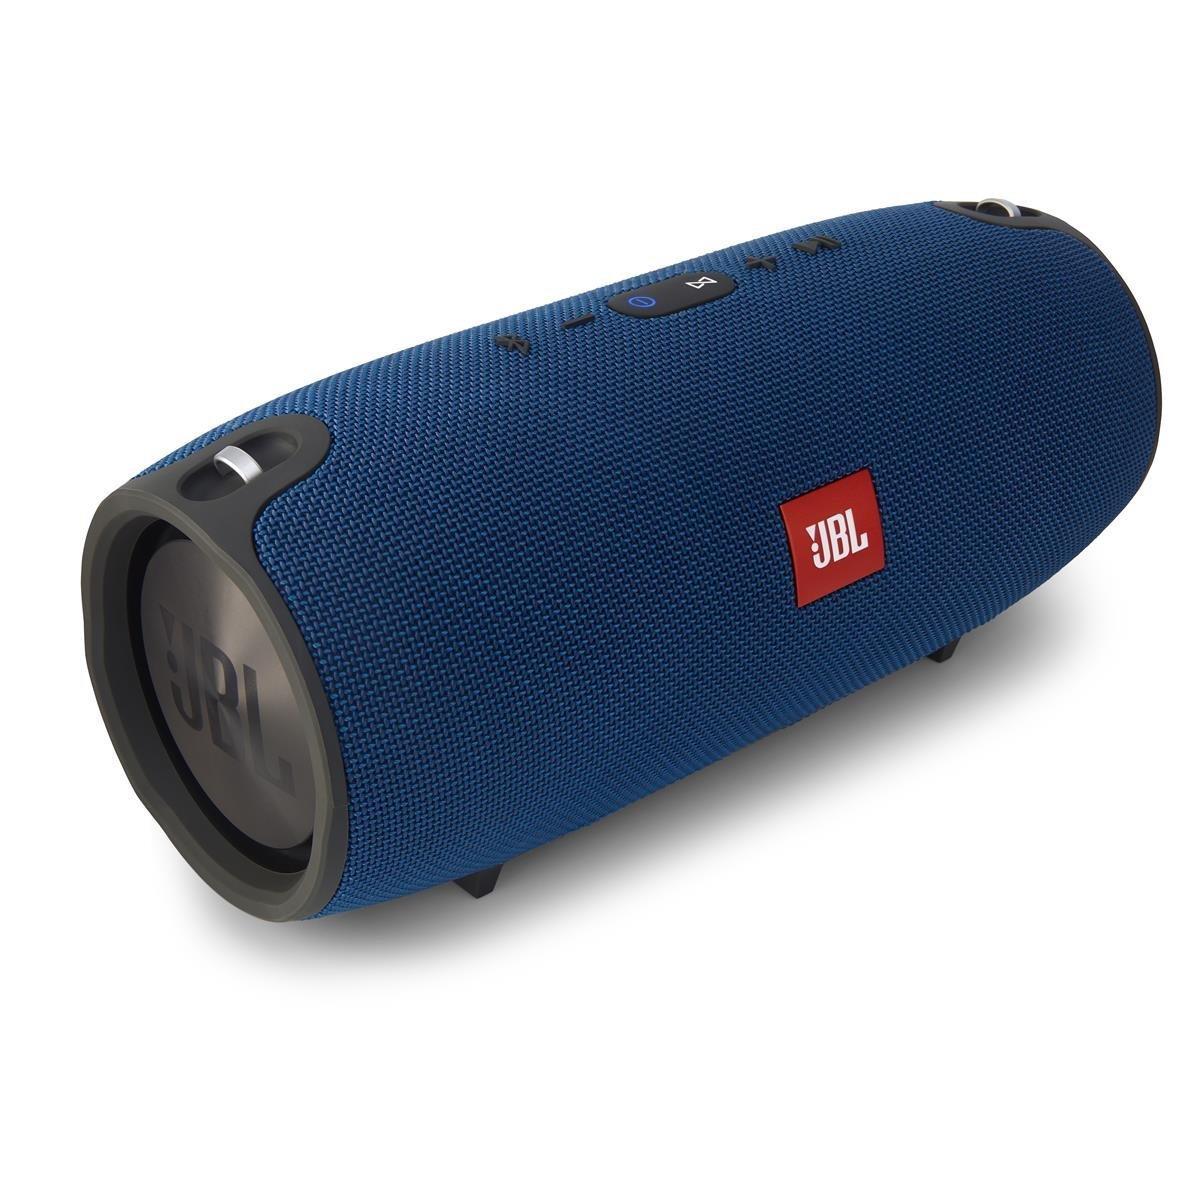 JBL Xtreme Portable Wireless Bluetooth Speaker (Blue) by JBL (Image #1)